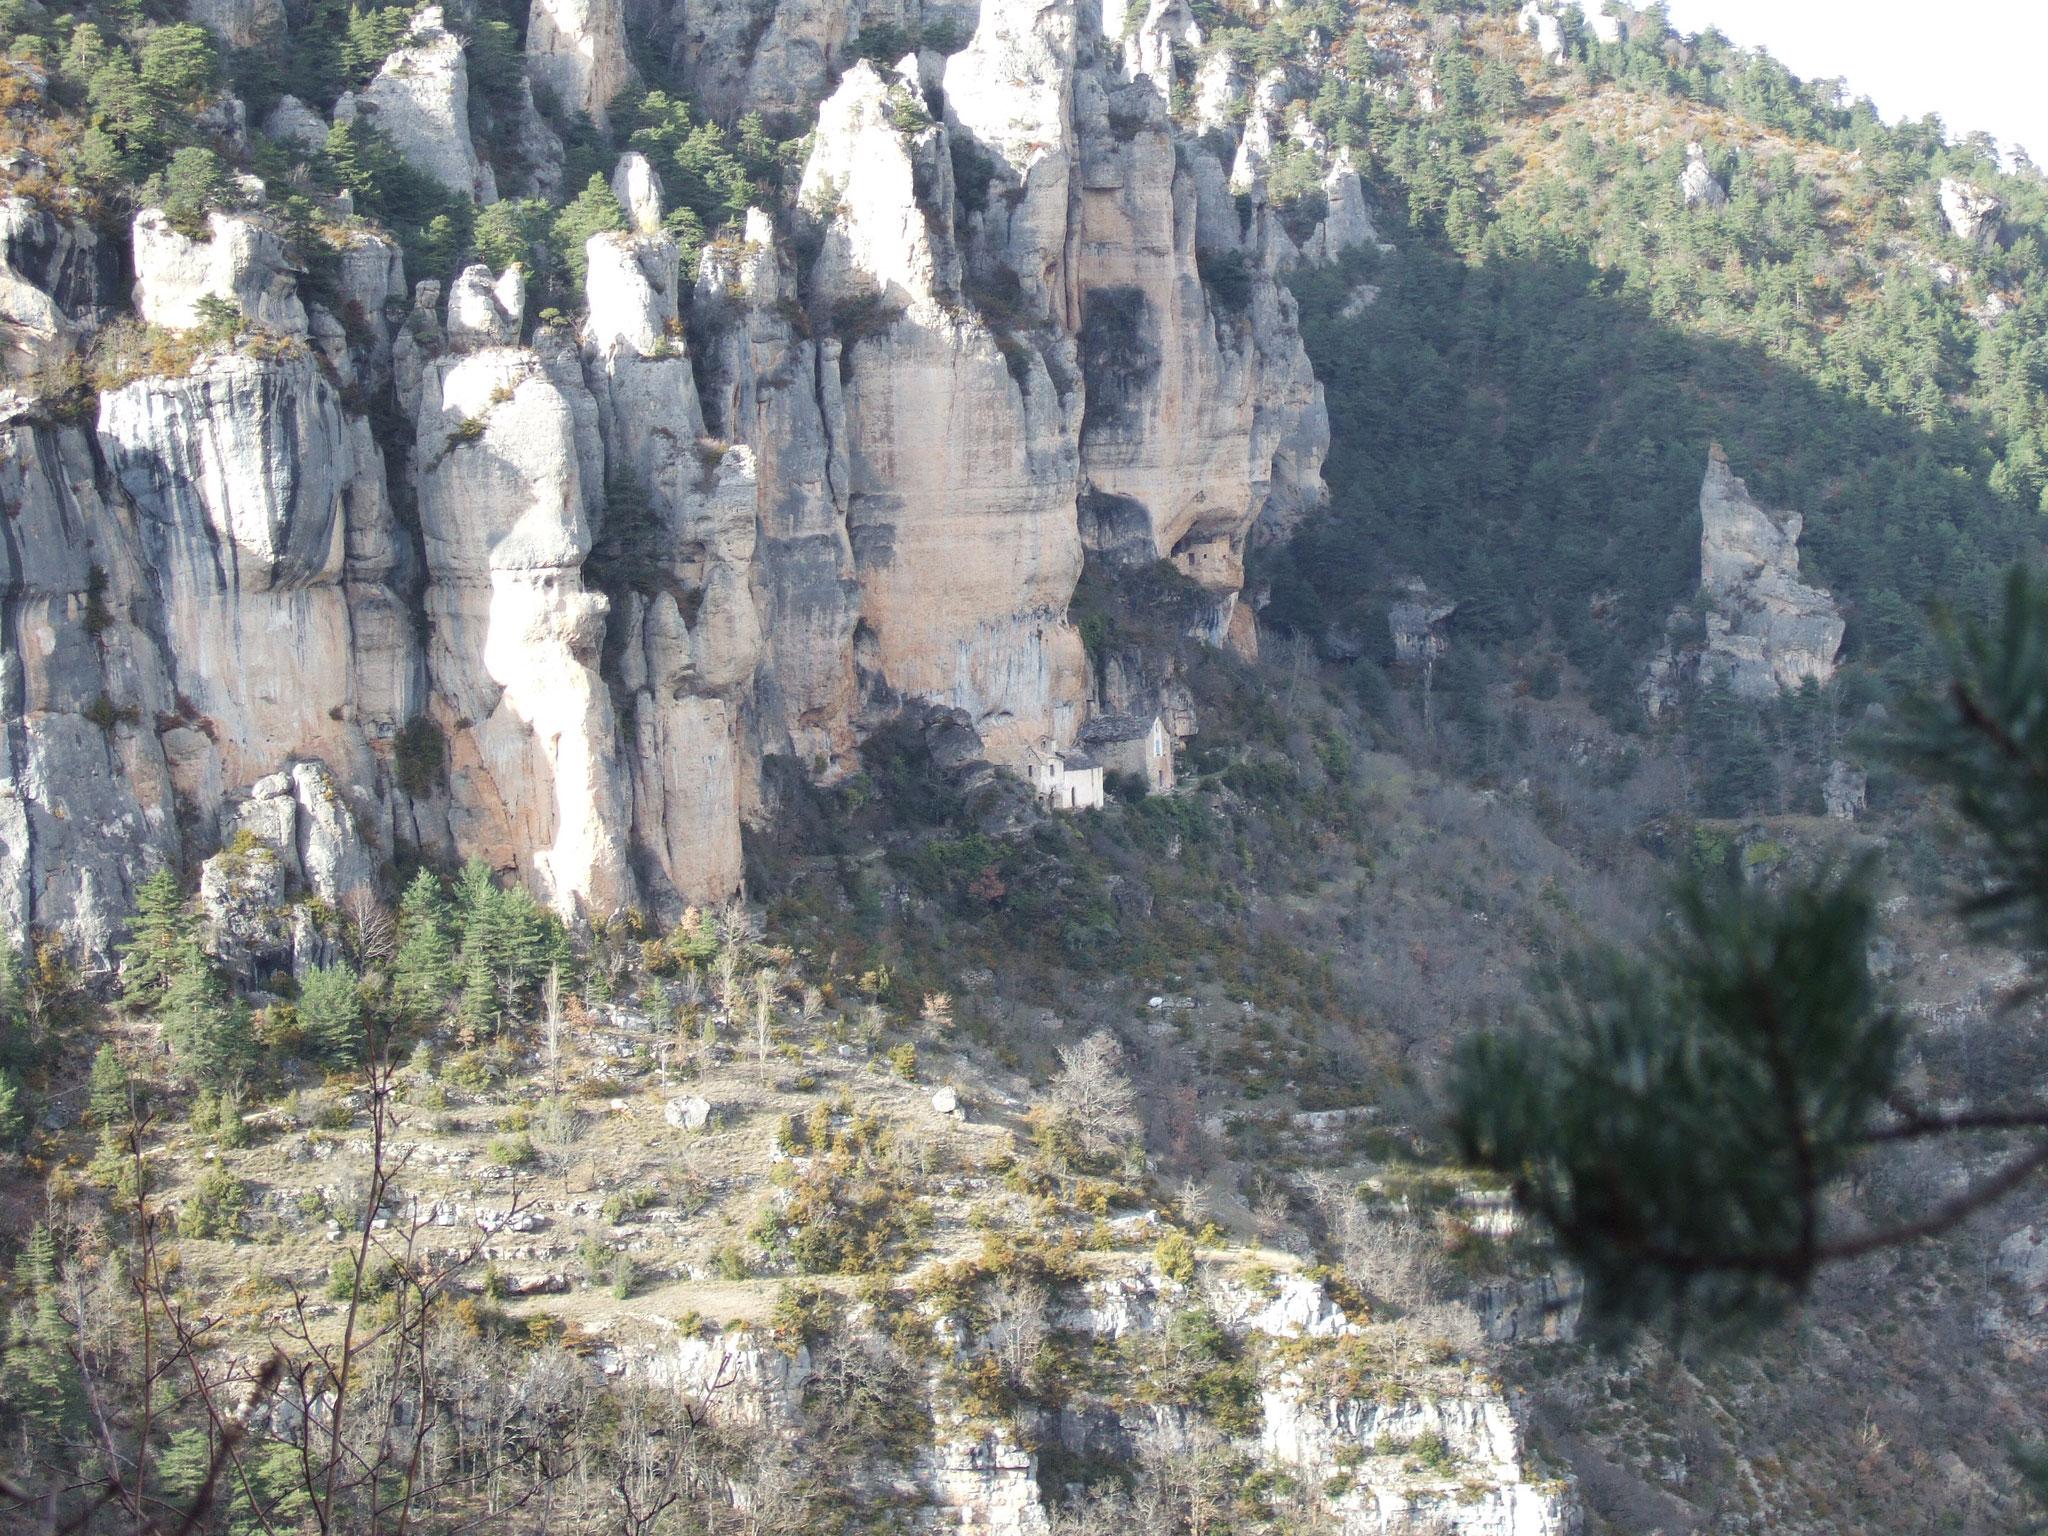 Cirque de Saint-Marcellin / gorges du Tarn